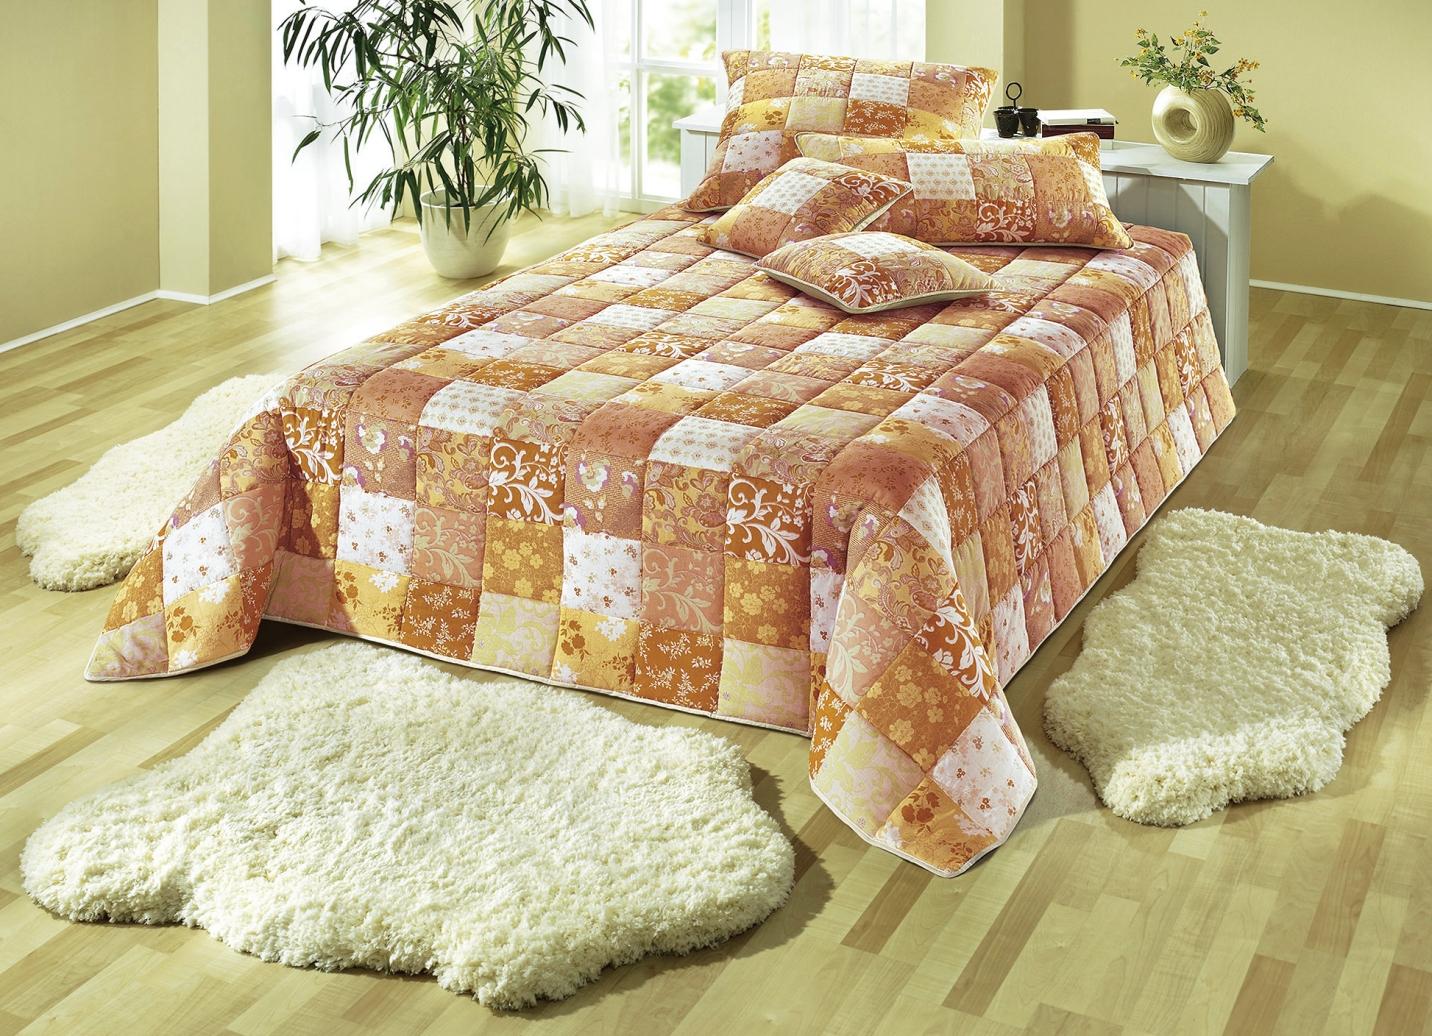 wohn accessoires in patchwork optik tagesdecken bader. Black Bedroom Furniture Sets. Home Design Ideas